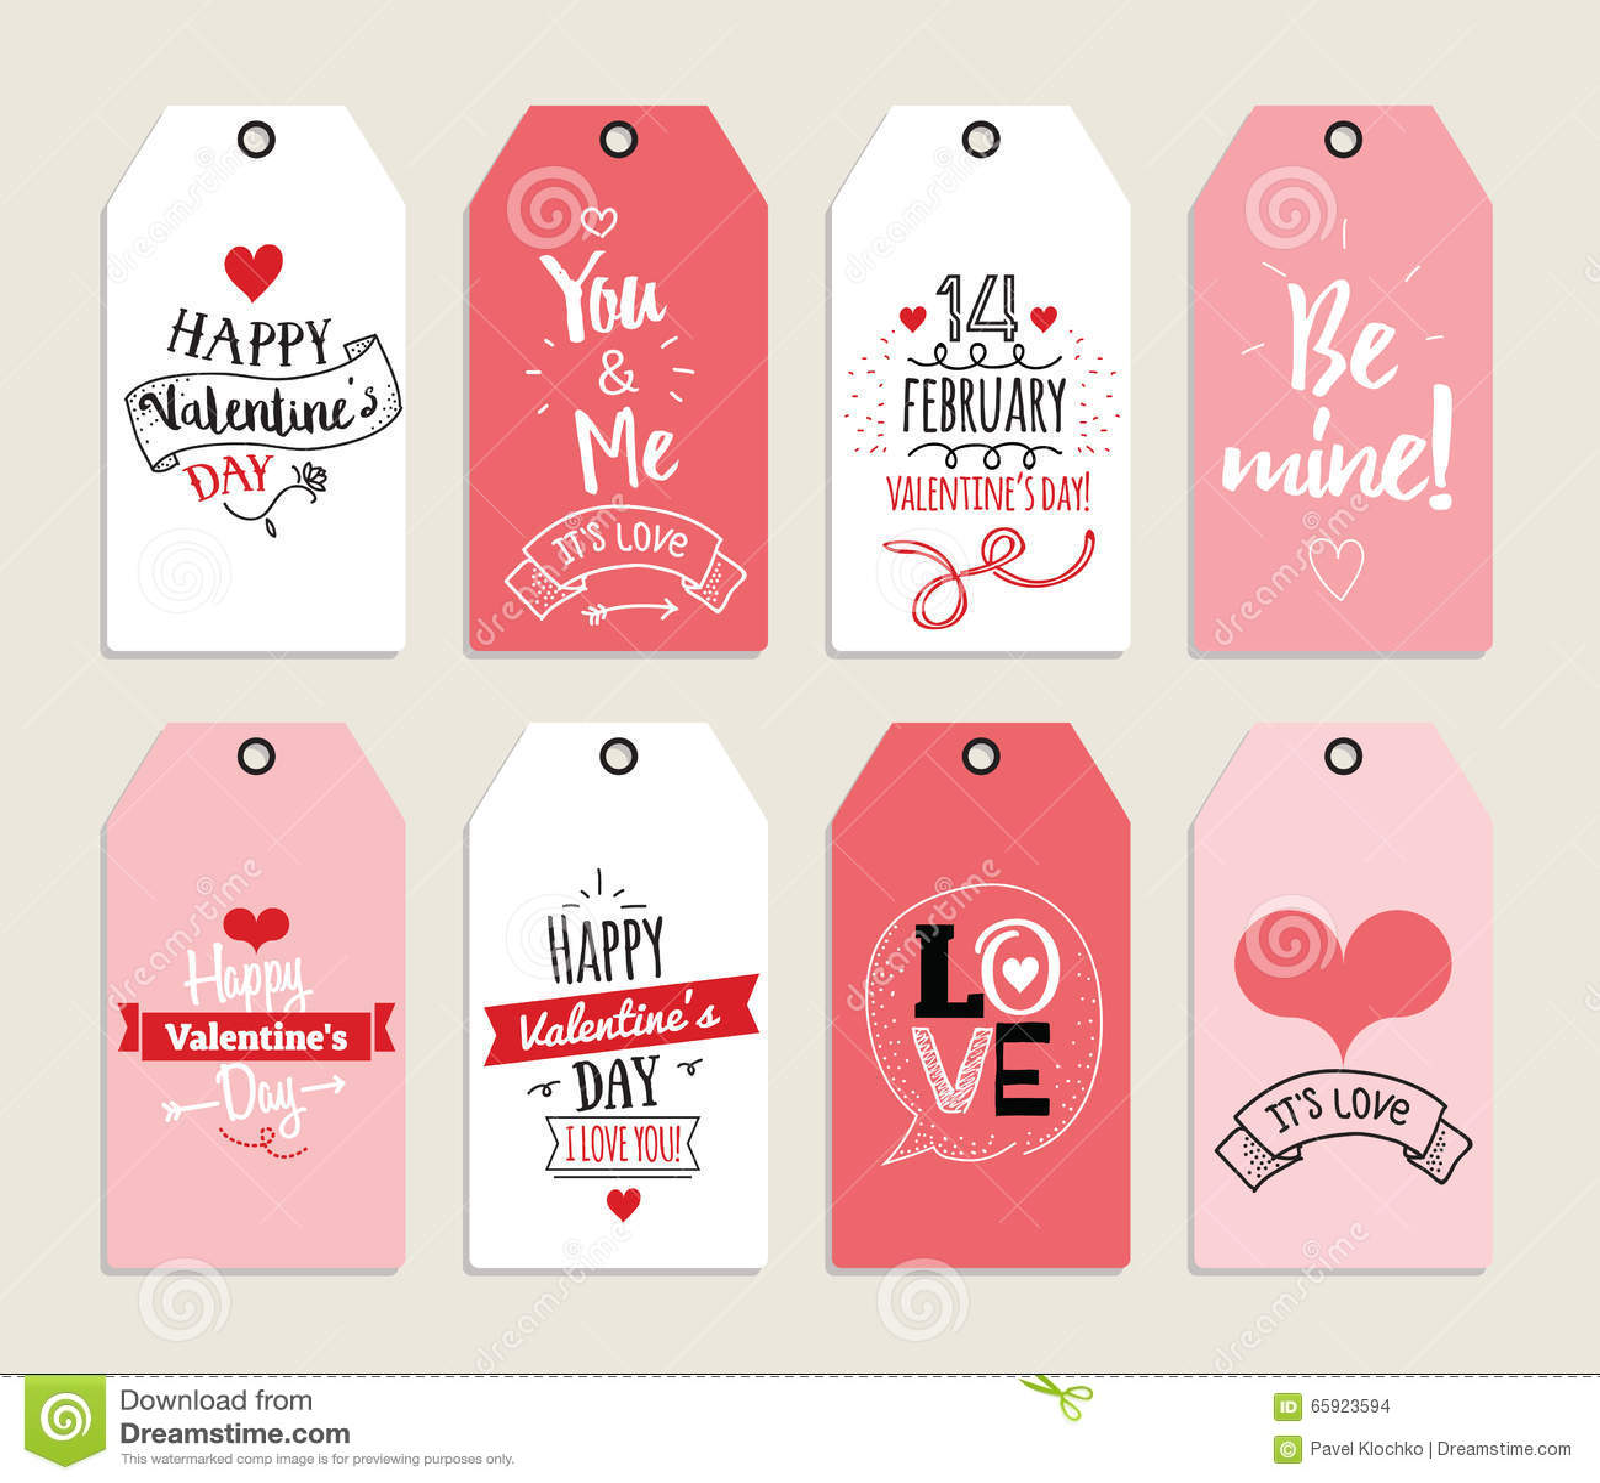 Wedding Invitation Christmas Ornament for perfect invitations ideas